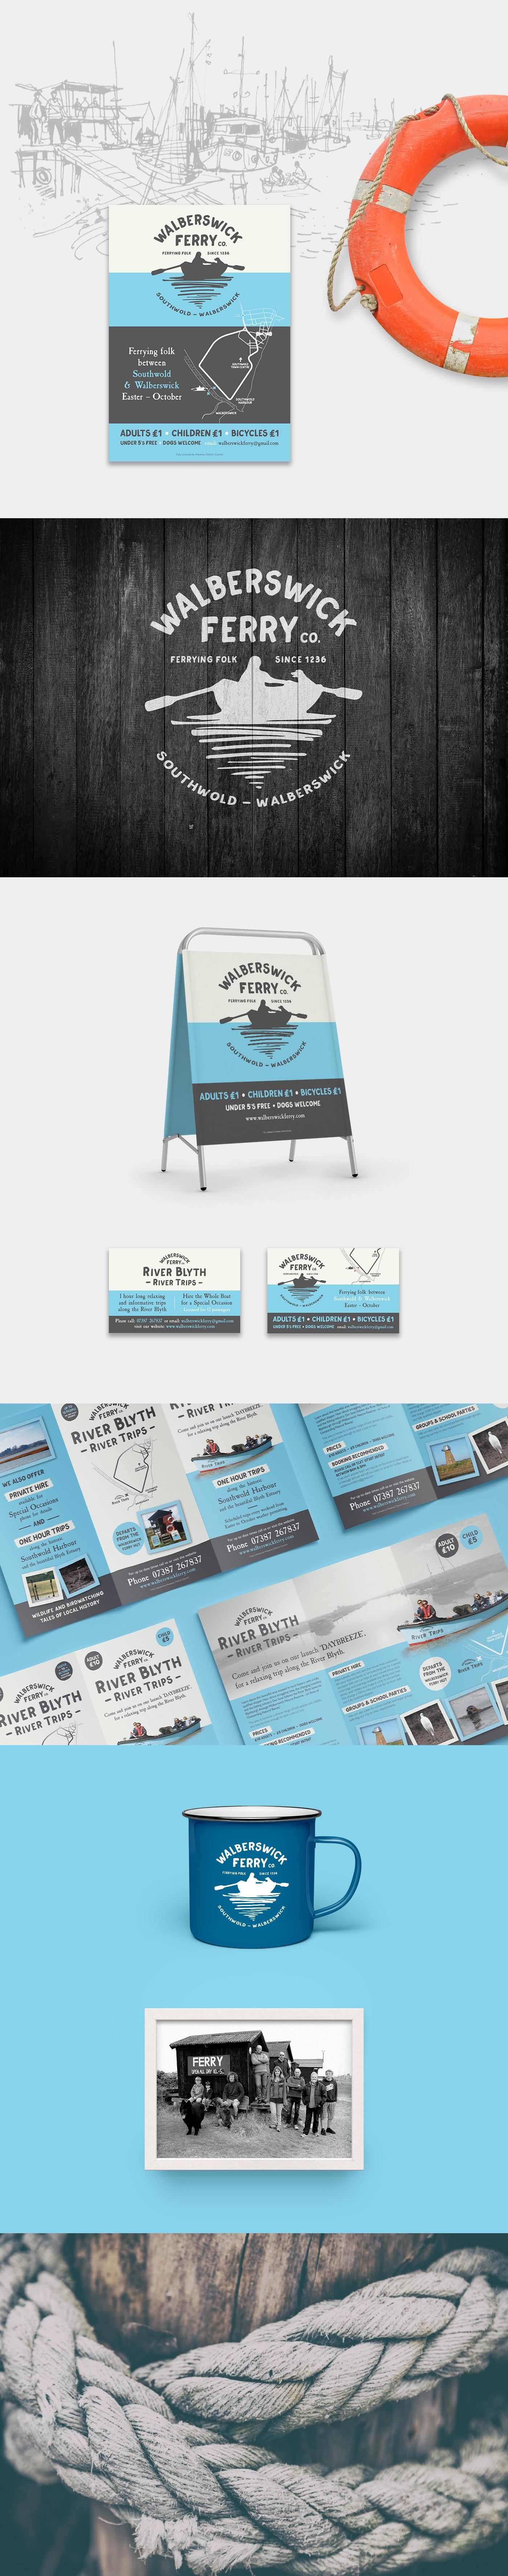 Walberswick Ferry Co Branding and Brochure